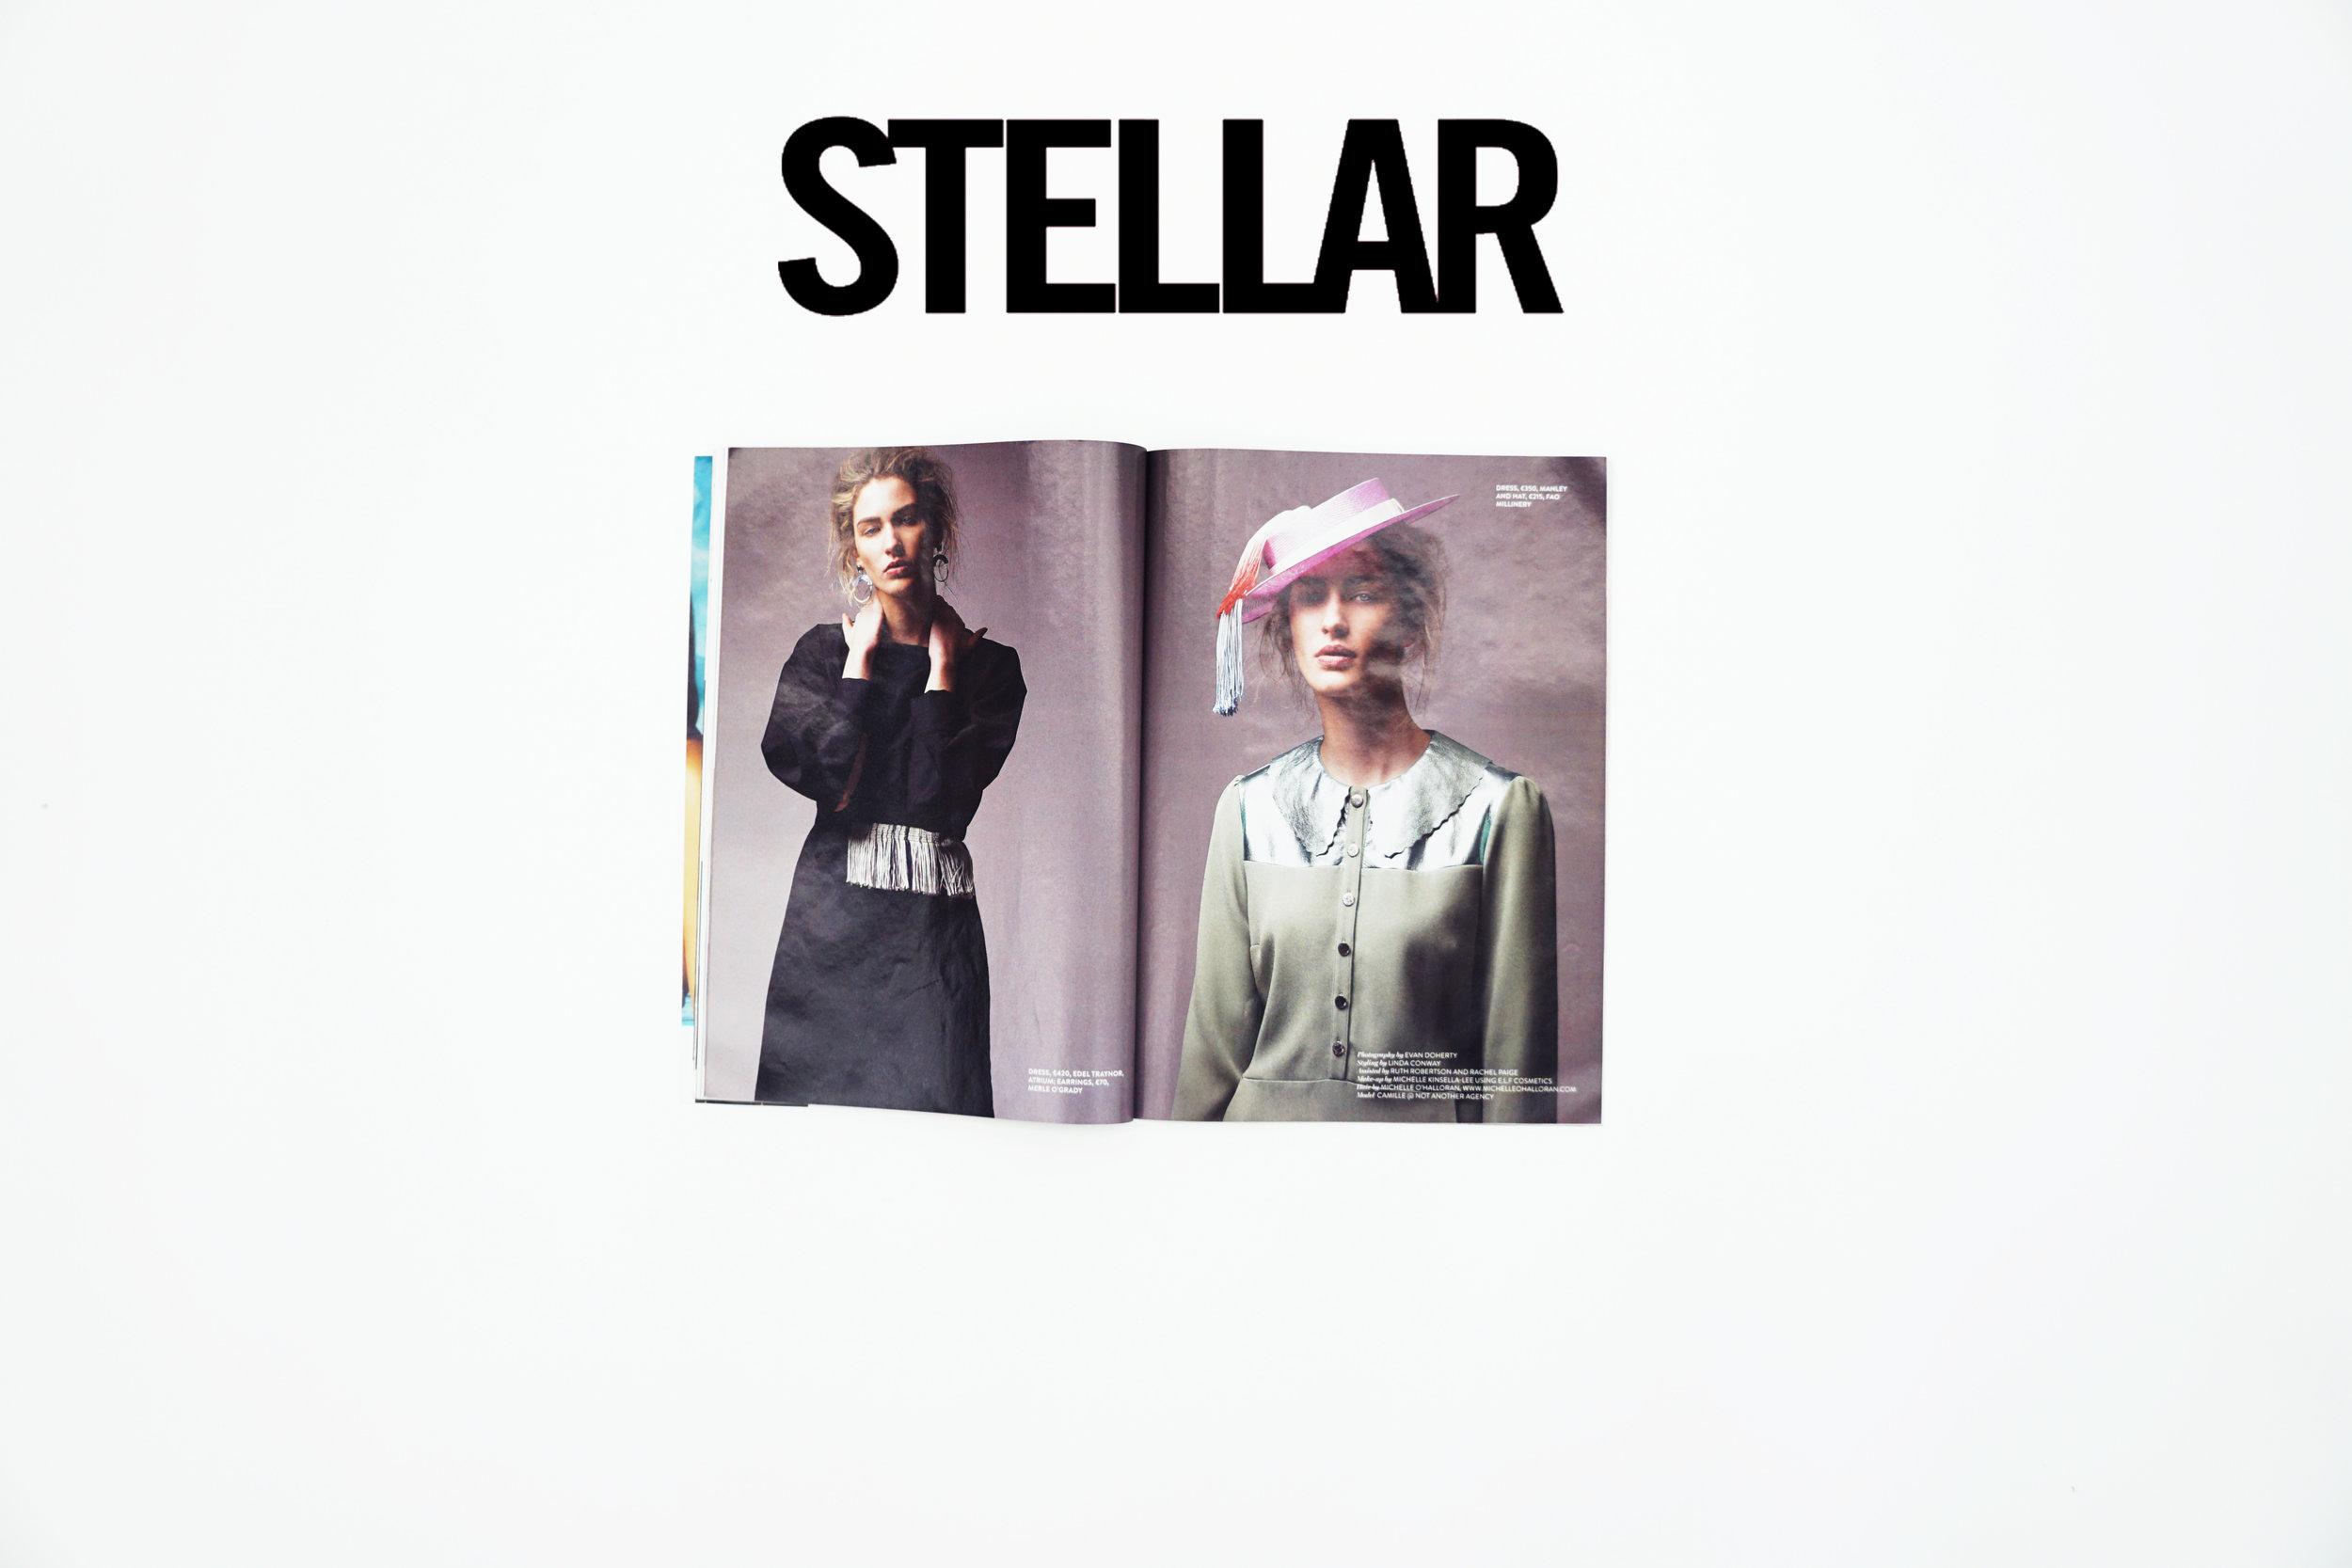 stellar 2.jpg